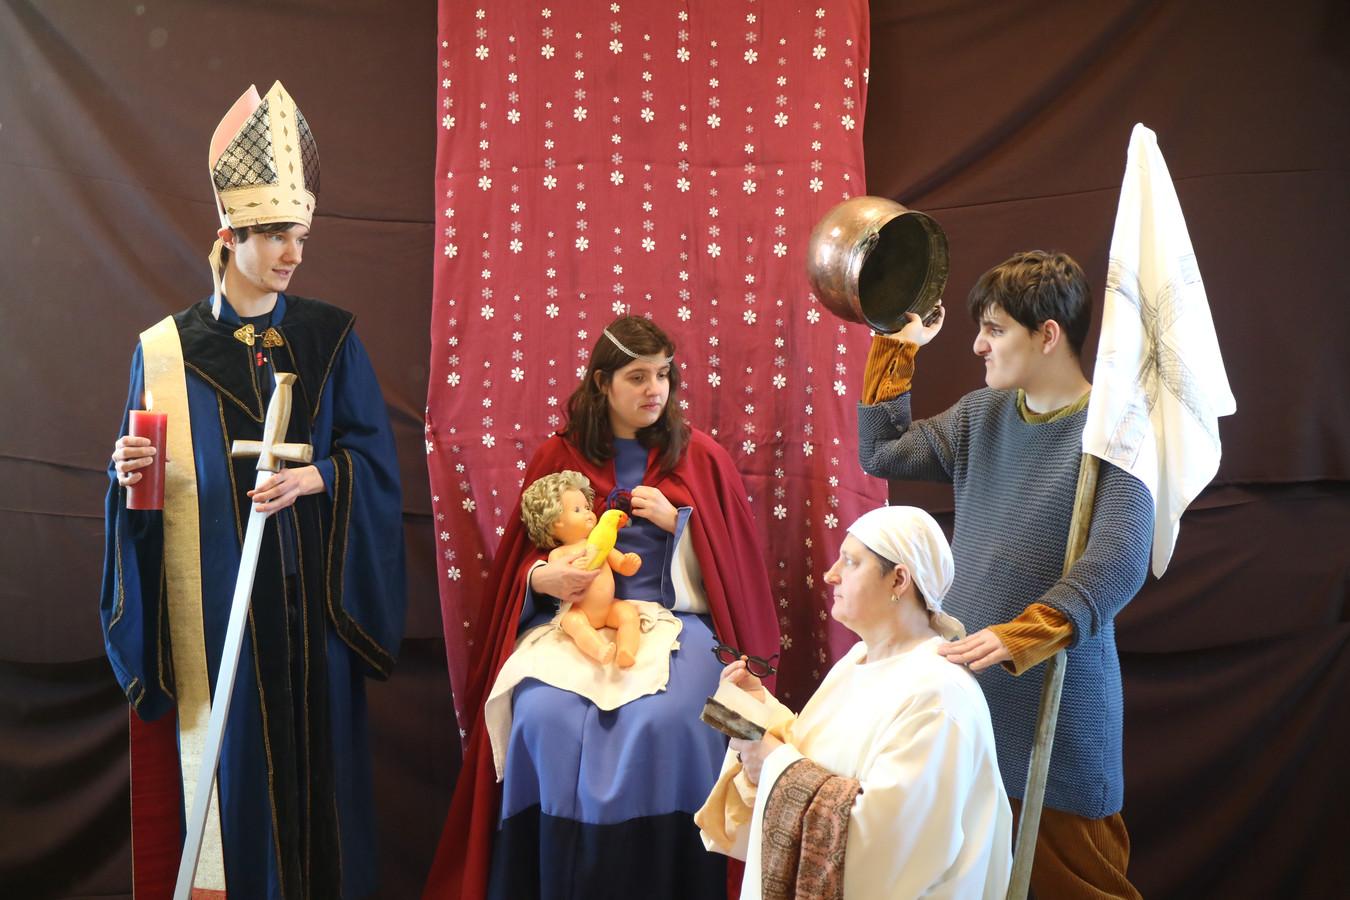 Thomas, Shauni, Jonas en Christel, cursisten van Sint-Rafaël, maken een tableau vivant van 'Madonna met kind en kanunnik Vanderpaele'.